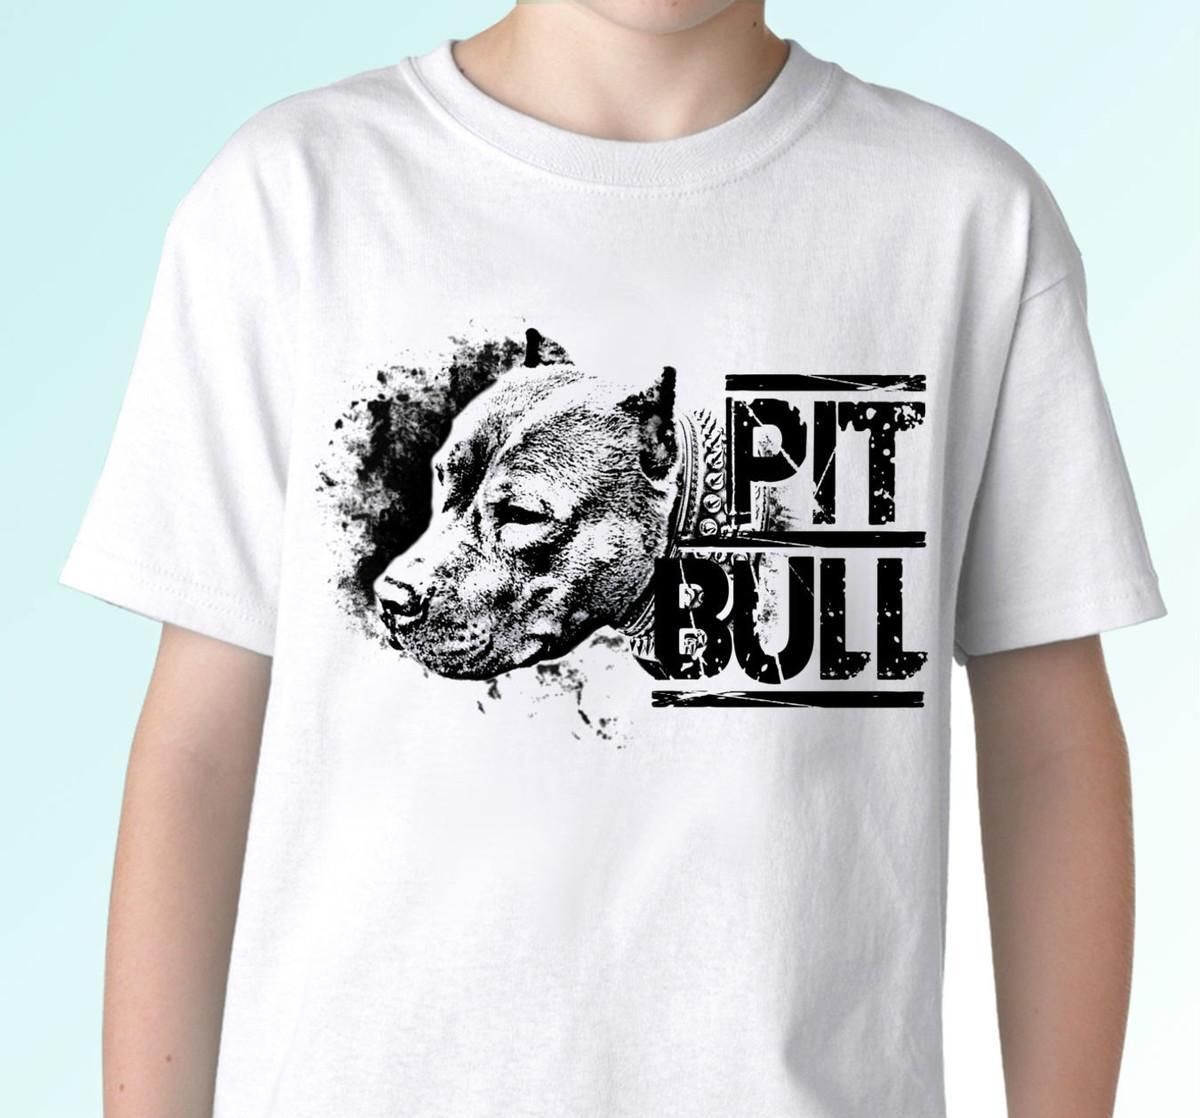 a75760850 Pitbull Dog T Shirt Pit Bull Top Tee Design Mens Womens Kids Baby Shirts  Cool Crazy Design Shirts From Yg02tshirt, $12.05| DHgate.Com